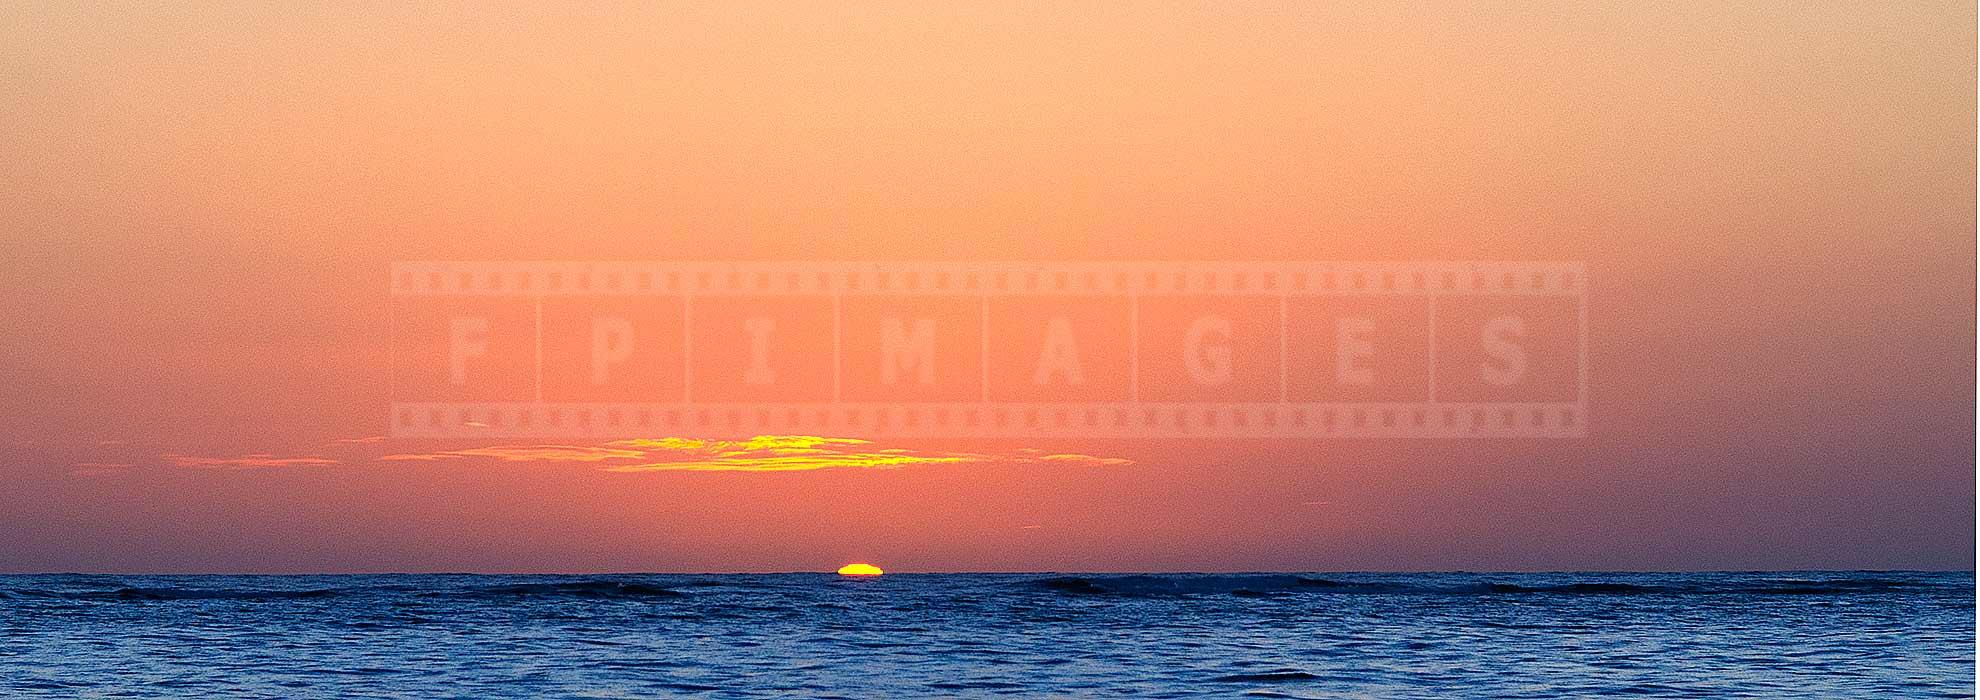 sun rising above the ocean in punta cana